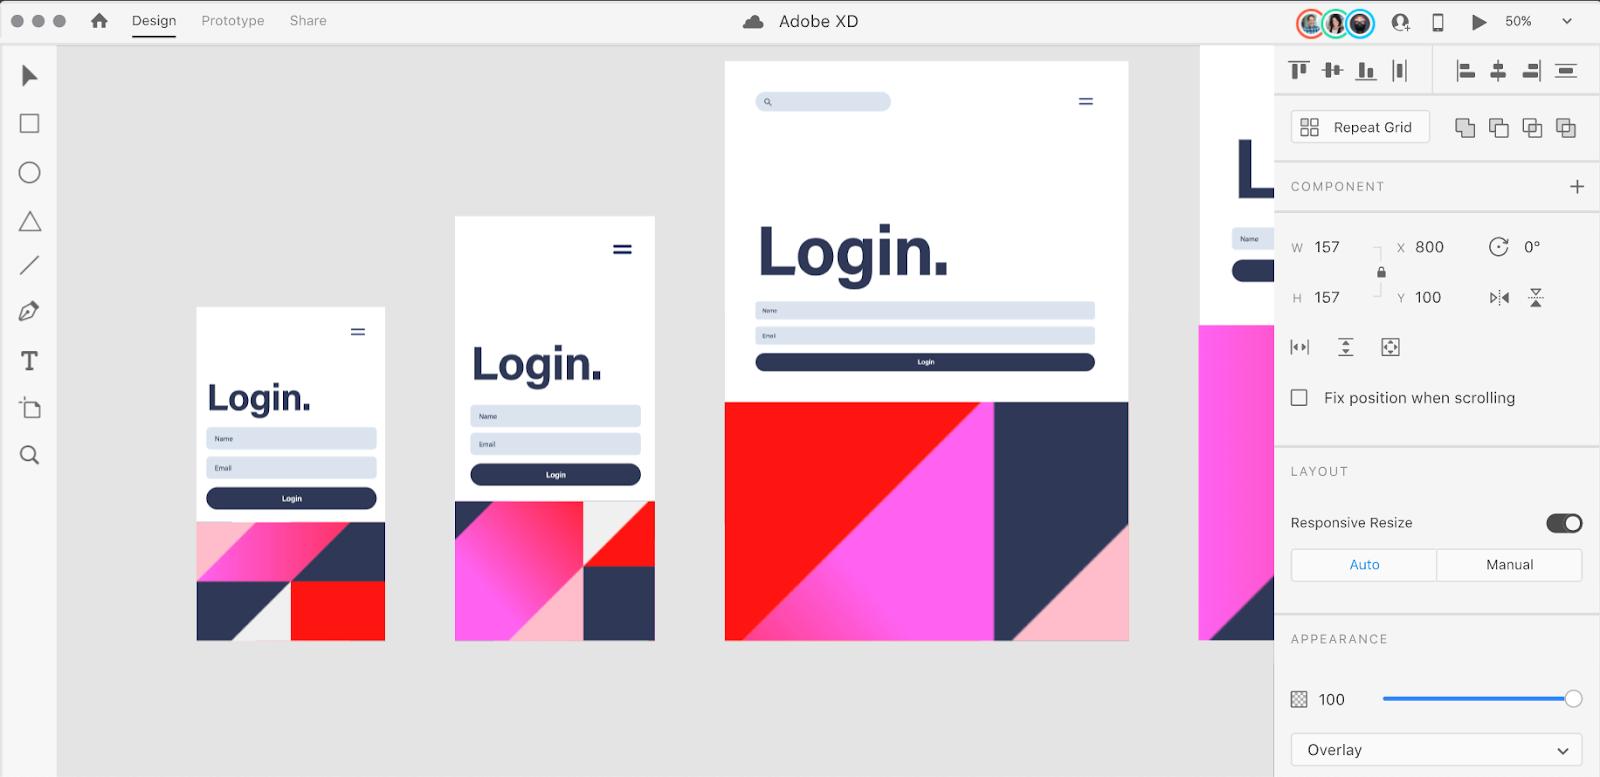 Adobe Creative Cloud mockup